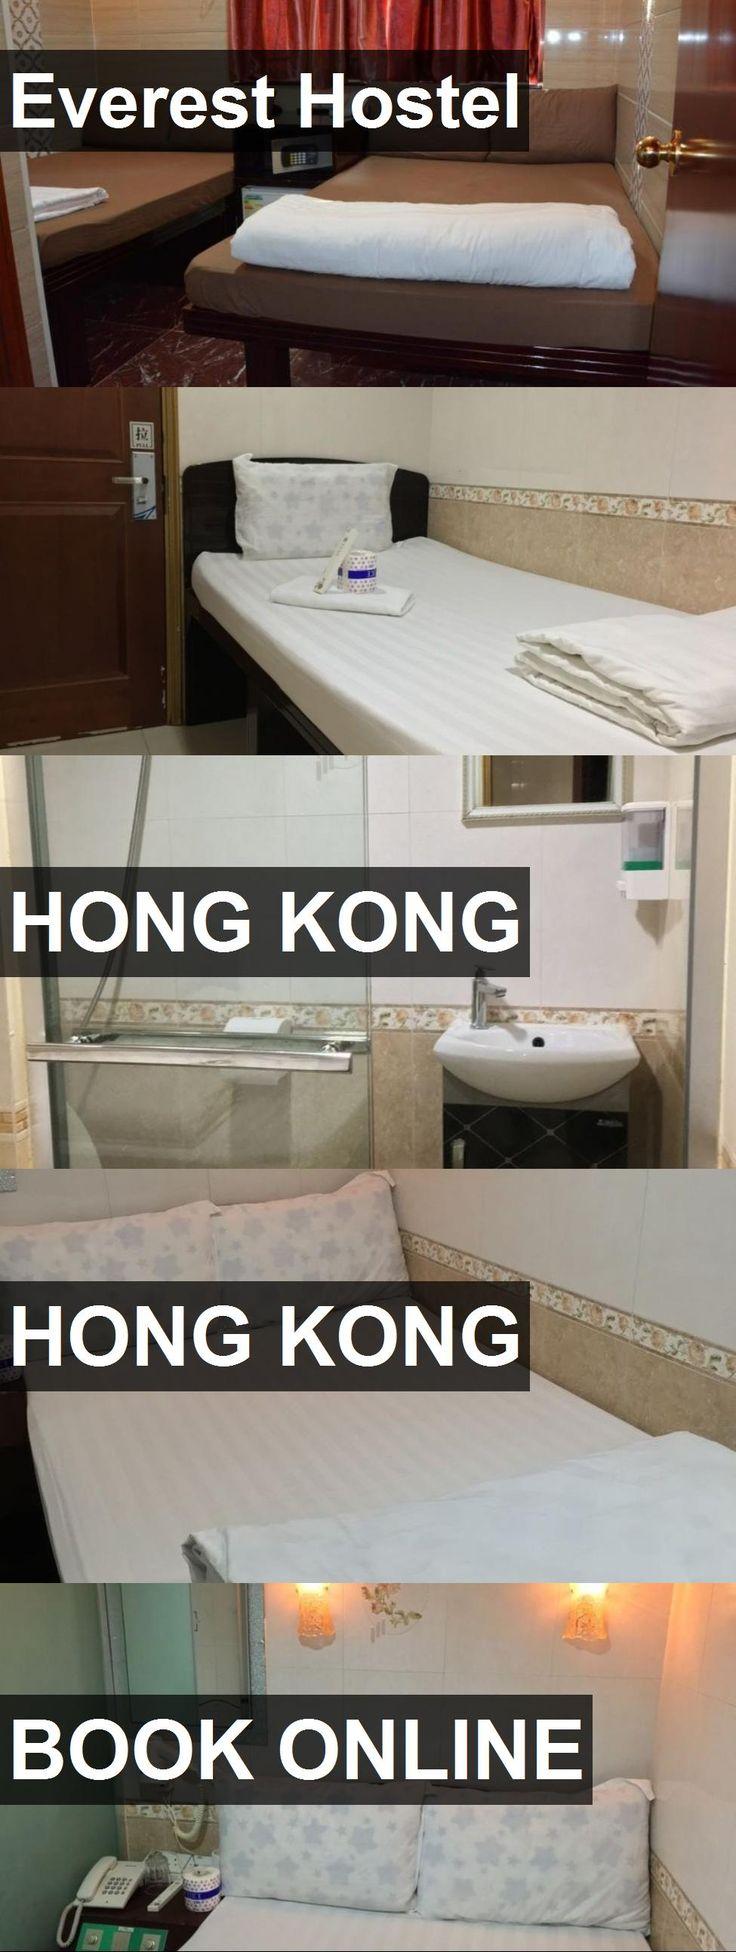 Everest Hostel in Hong Kong, Hong Kong. For more information, photos, reviews and best prices please follow the link. #HongKong #HongKong #travel #vacation #hostel